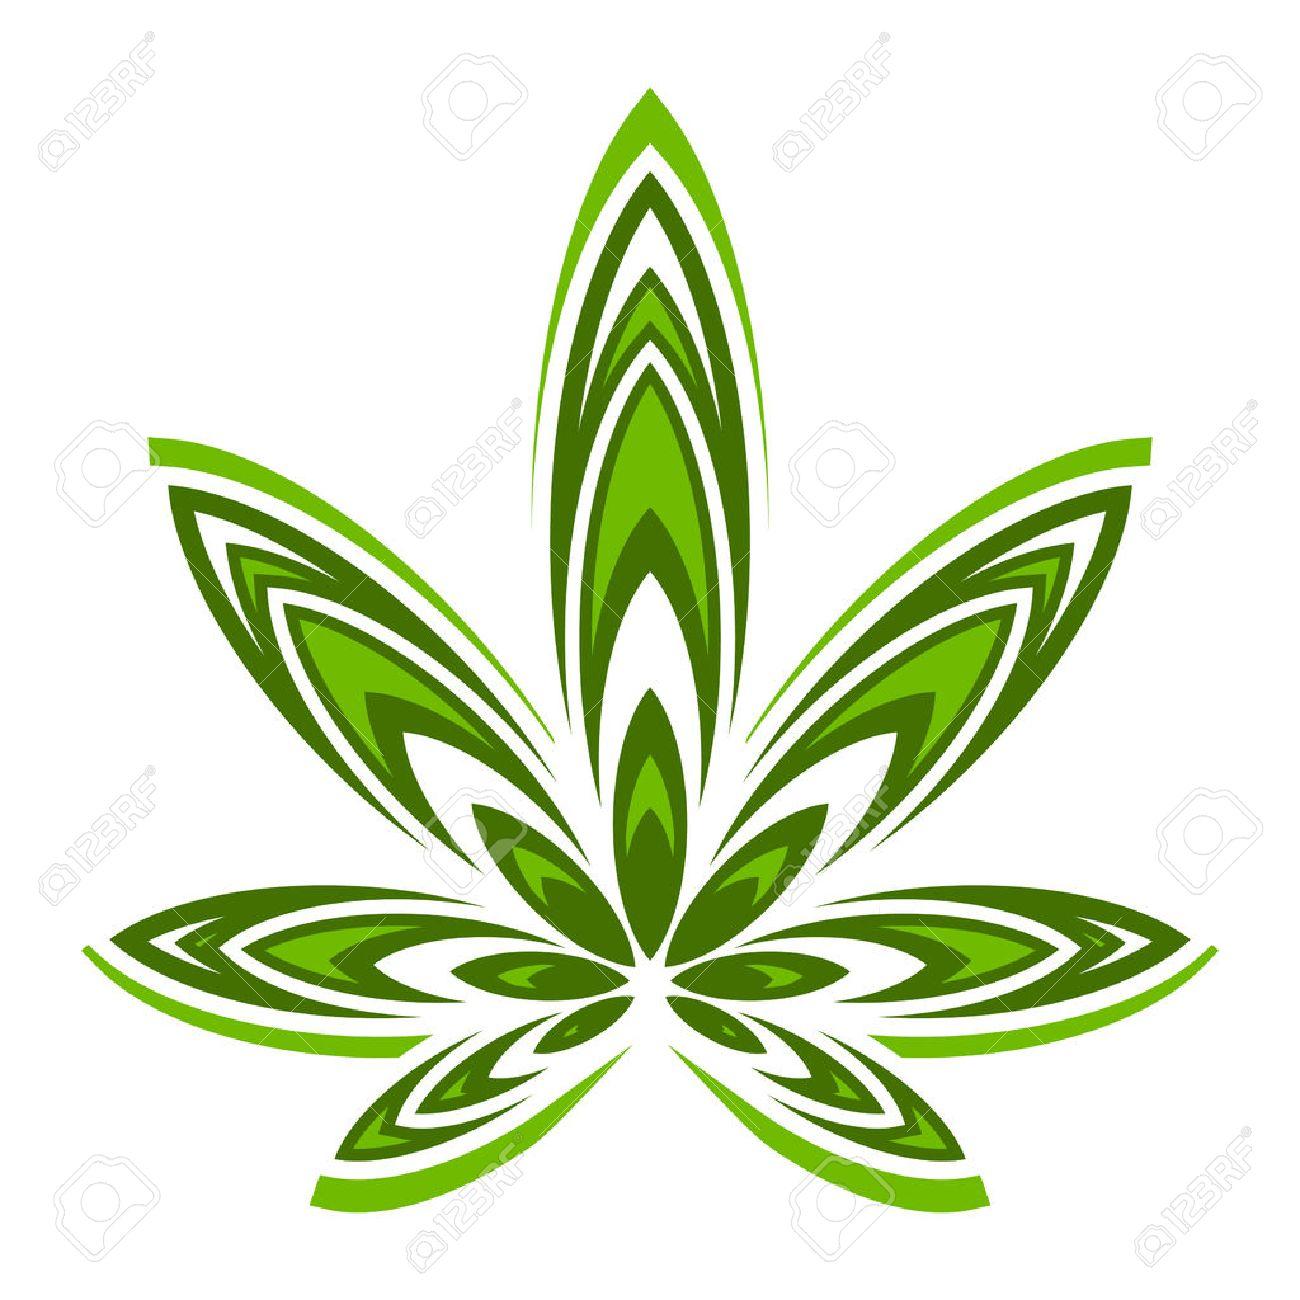 Marijuana pot weed leaf symbol royalty free cliparts vectors and marijuana pot weed leaf symbol stock vector 49650658 biocorpaavc Choice Image